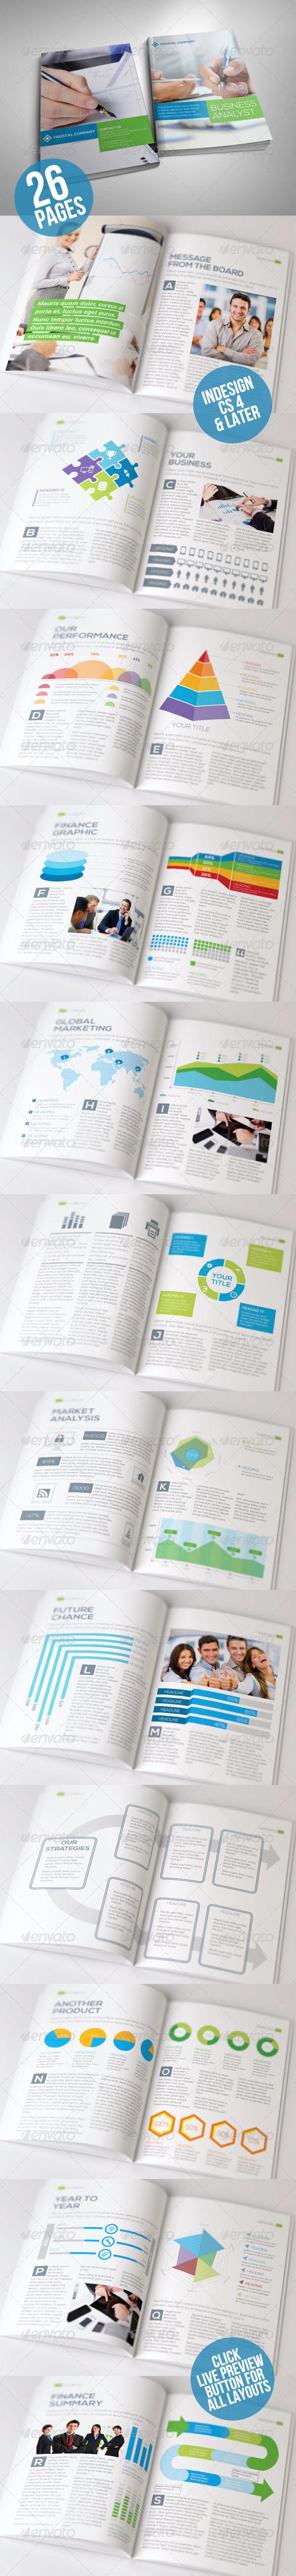 GraphicRiver Infographic Annual Report Volume 2 5413440